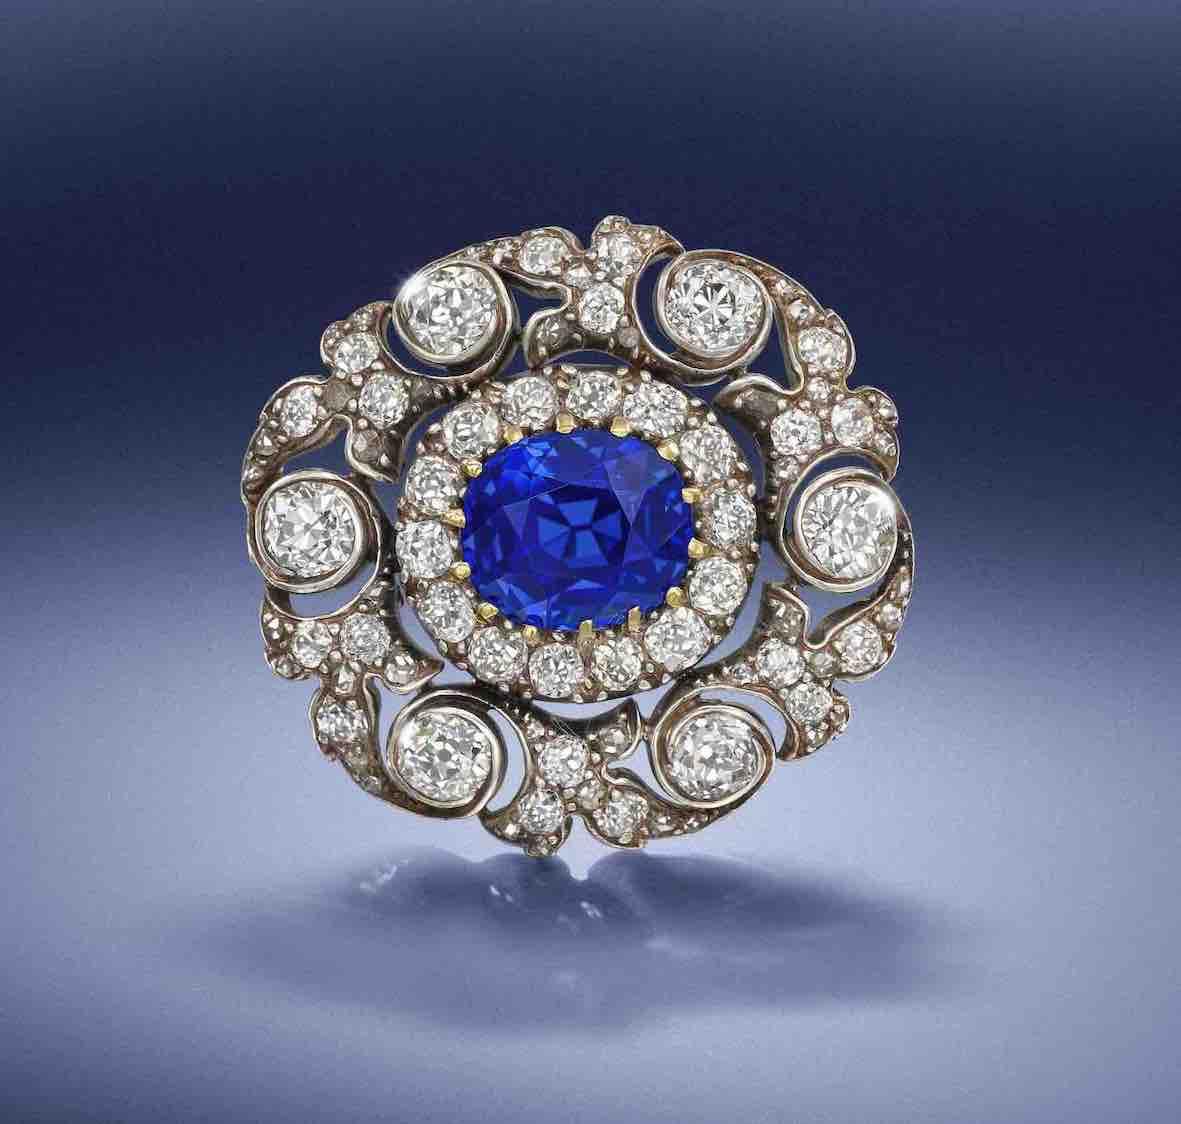 Late 19th Century Sapphire and Diamond Brooch